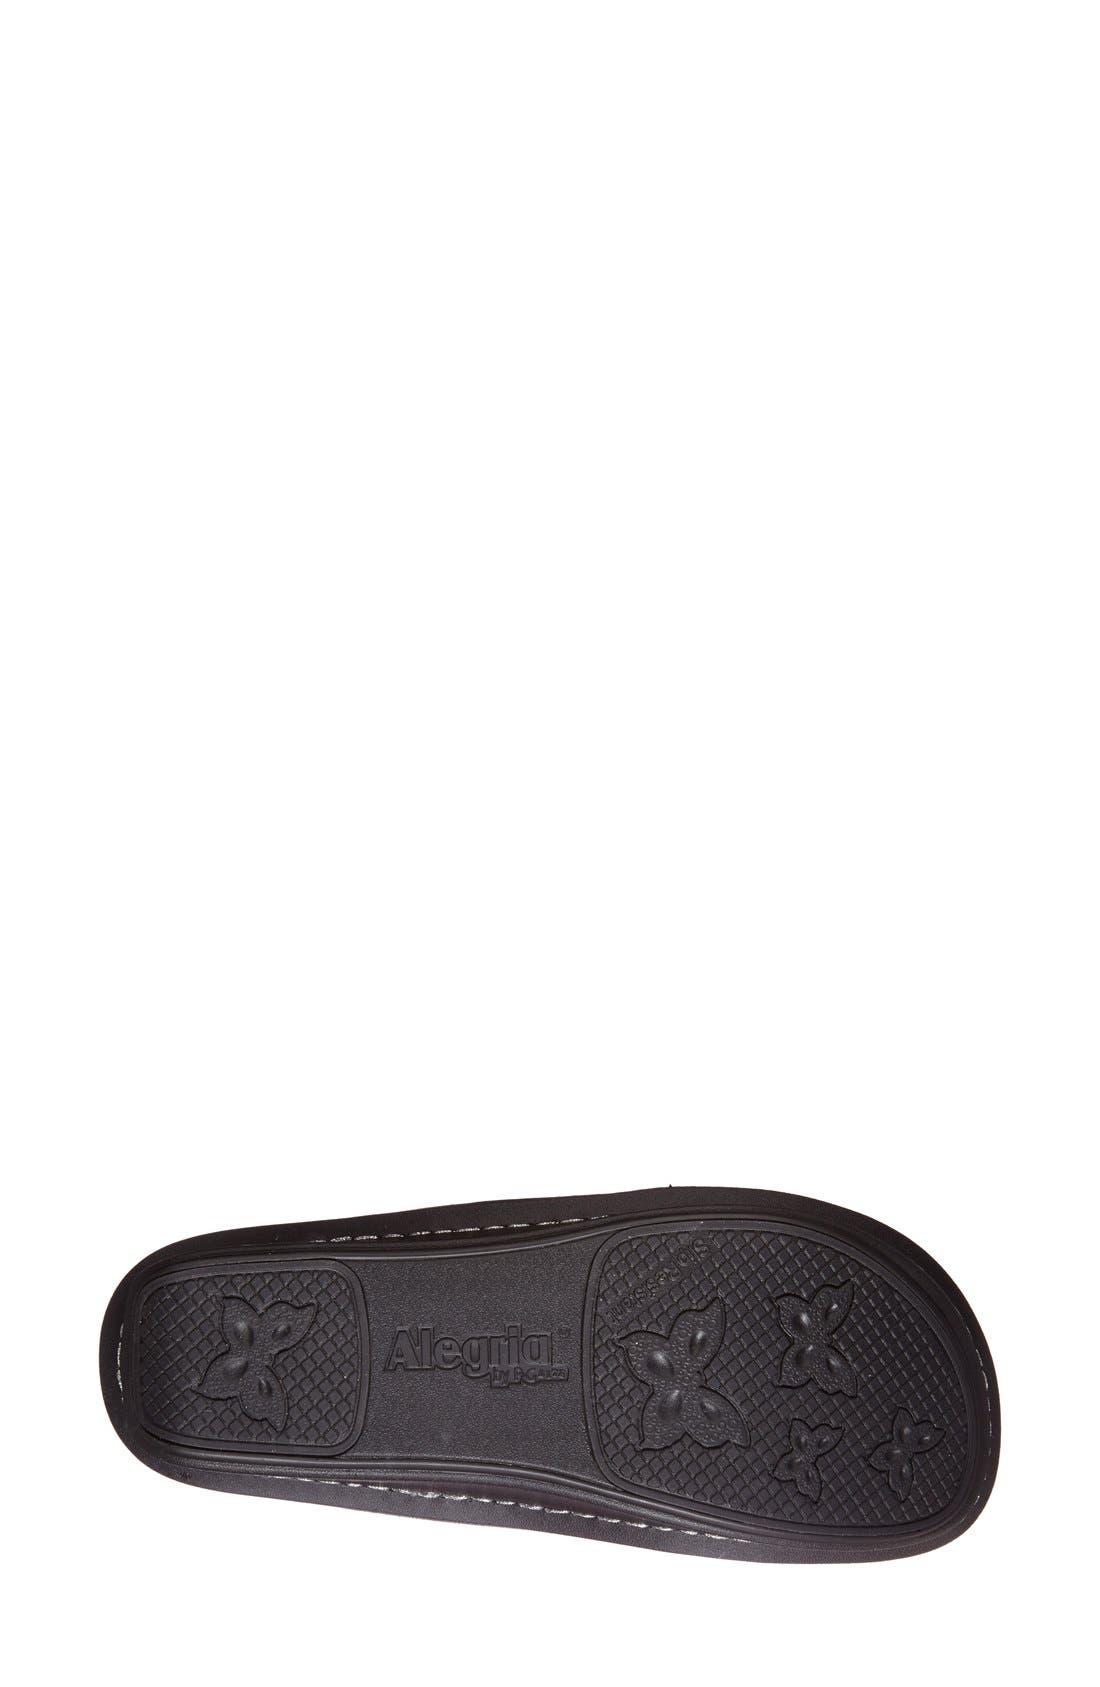 'Colette' Platform Sandal,                             Alternate thumbnail 27, color,